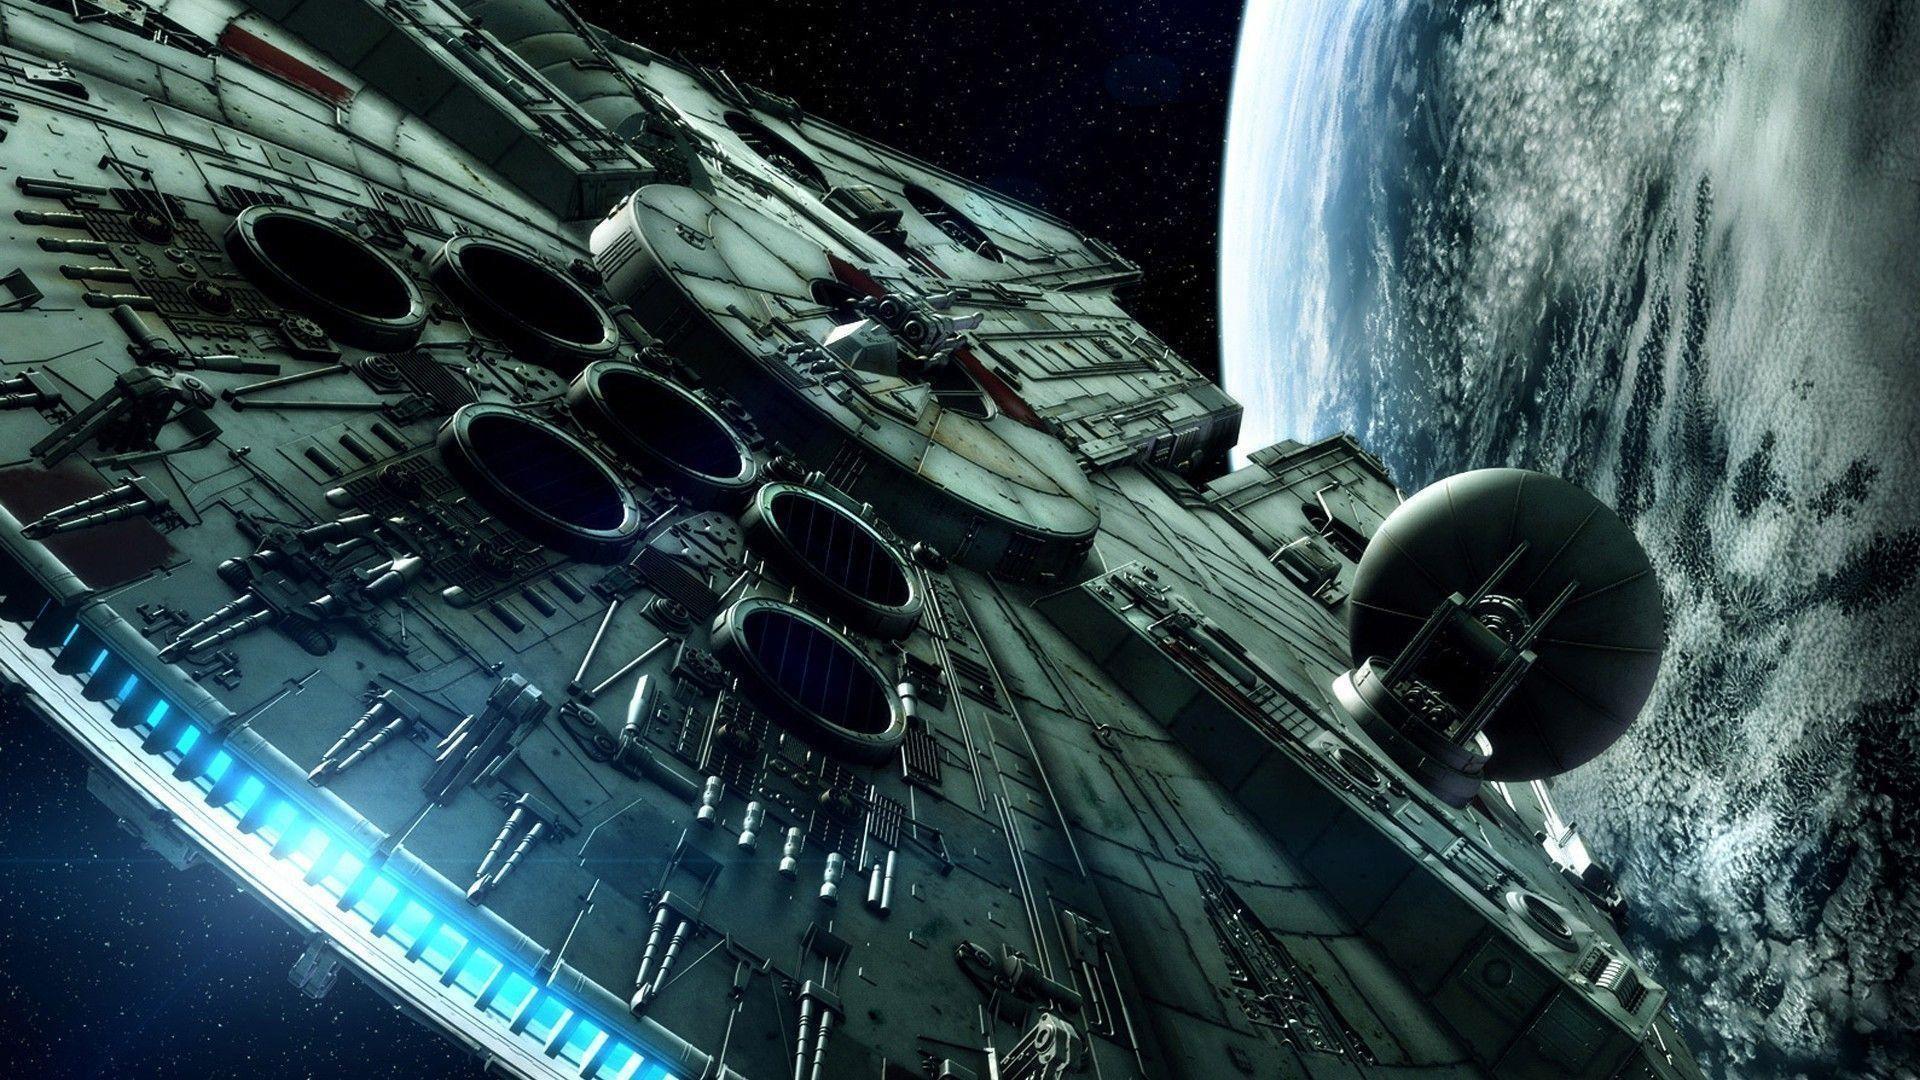 The Millenium Falcon – Star Wars wallpaper – Free Wide HD Wallpaper